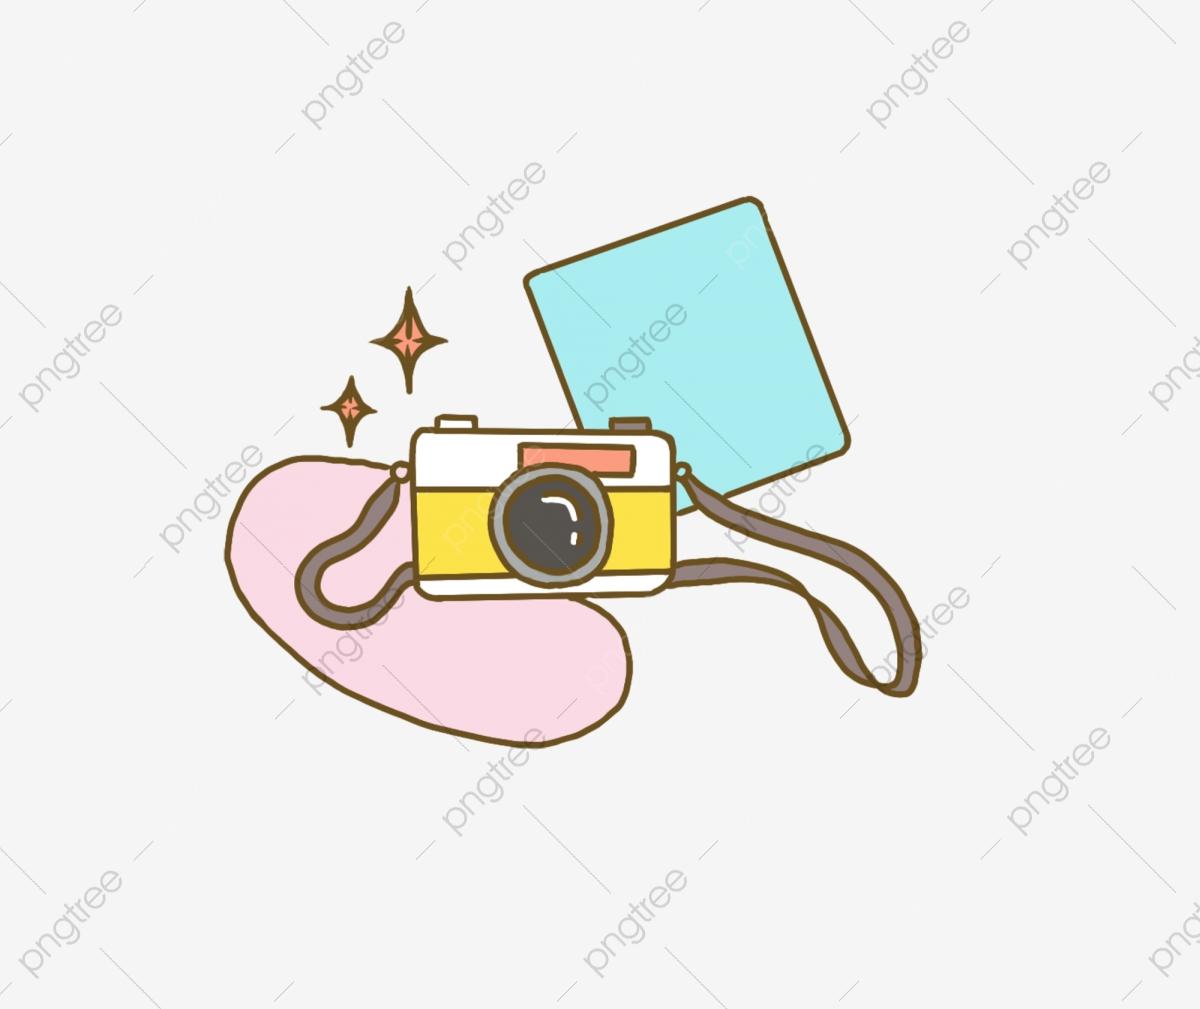 Photographer clipart camera flash. Photography design theme hand